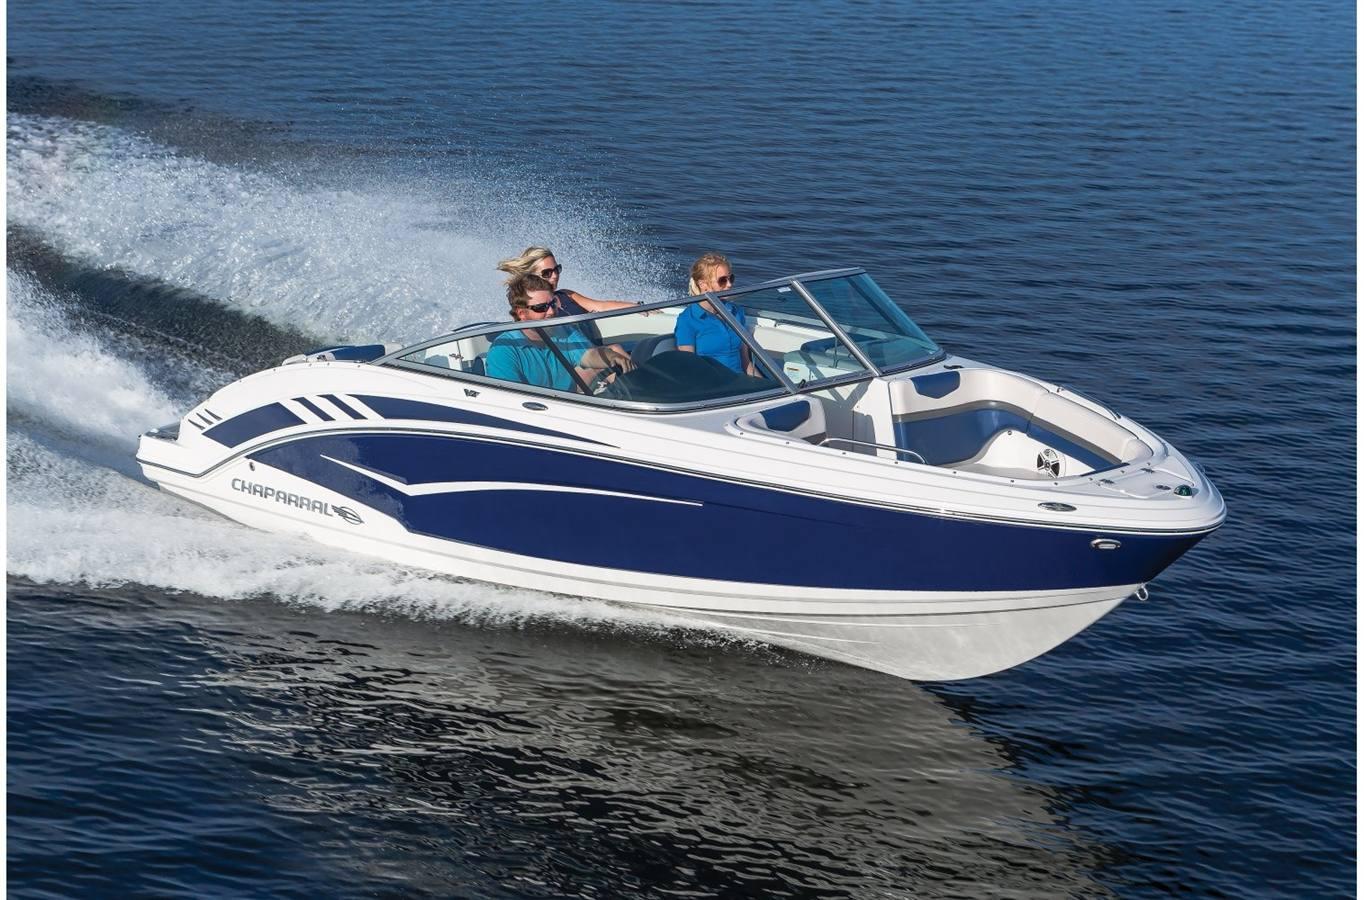 2019 Vortex Boats 203 Vortex for sale in North Billerica, MA